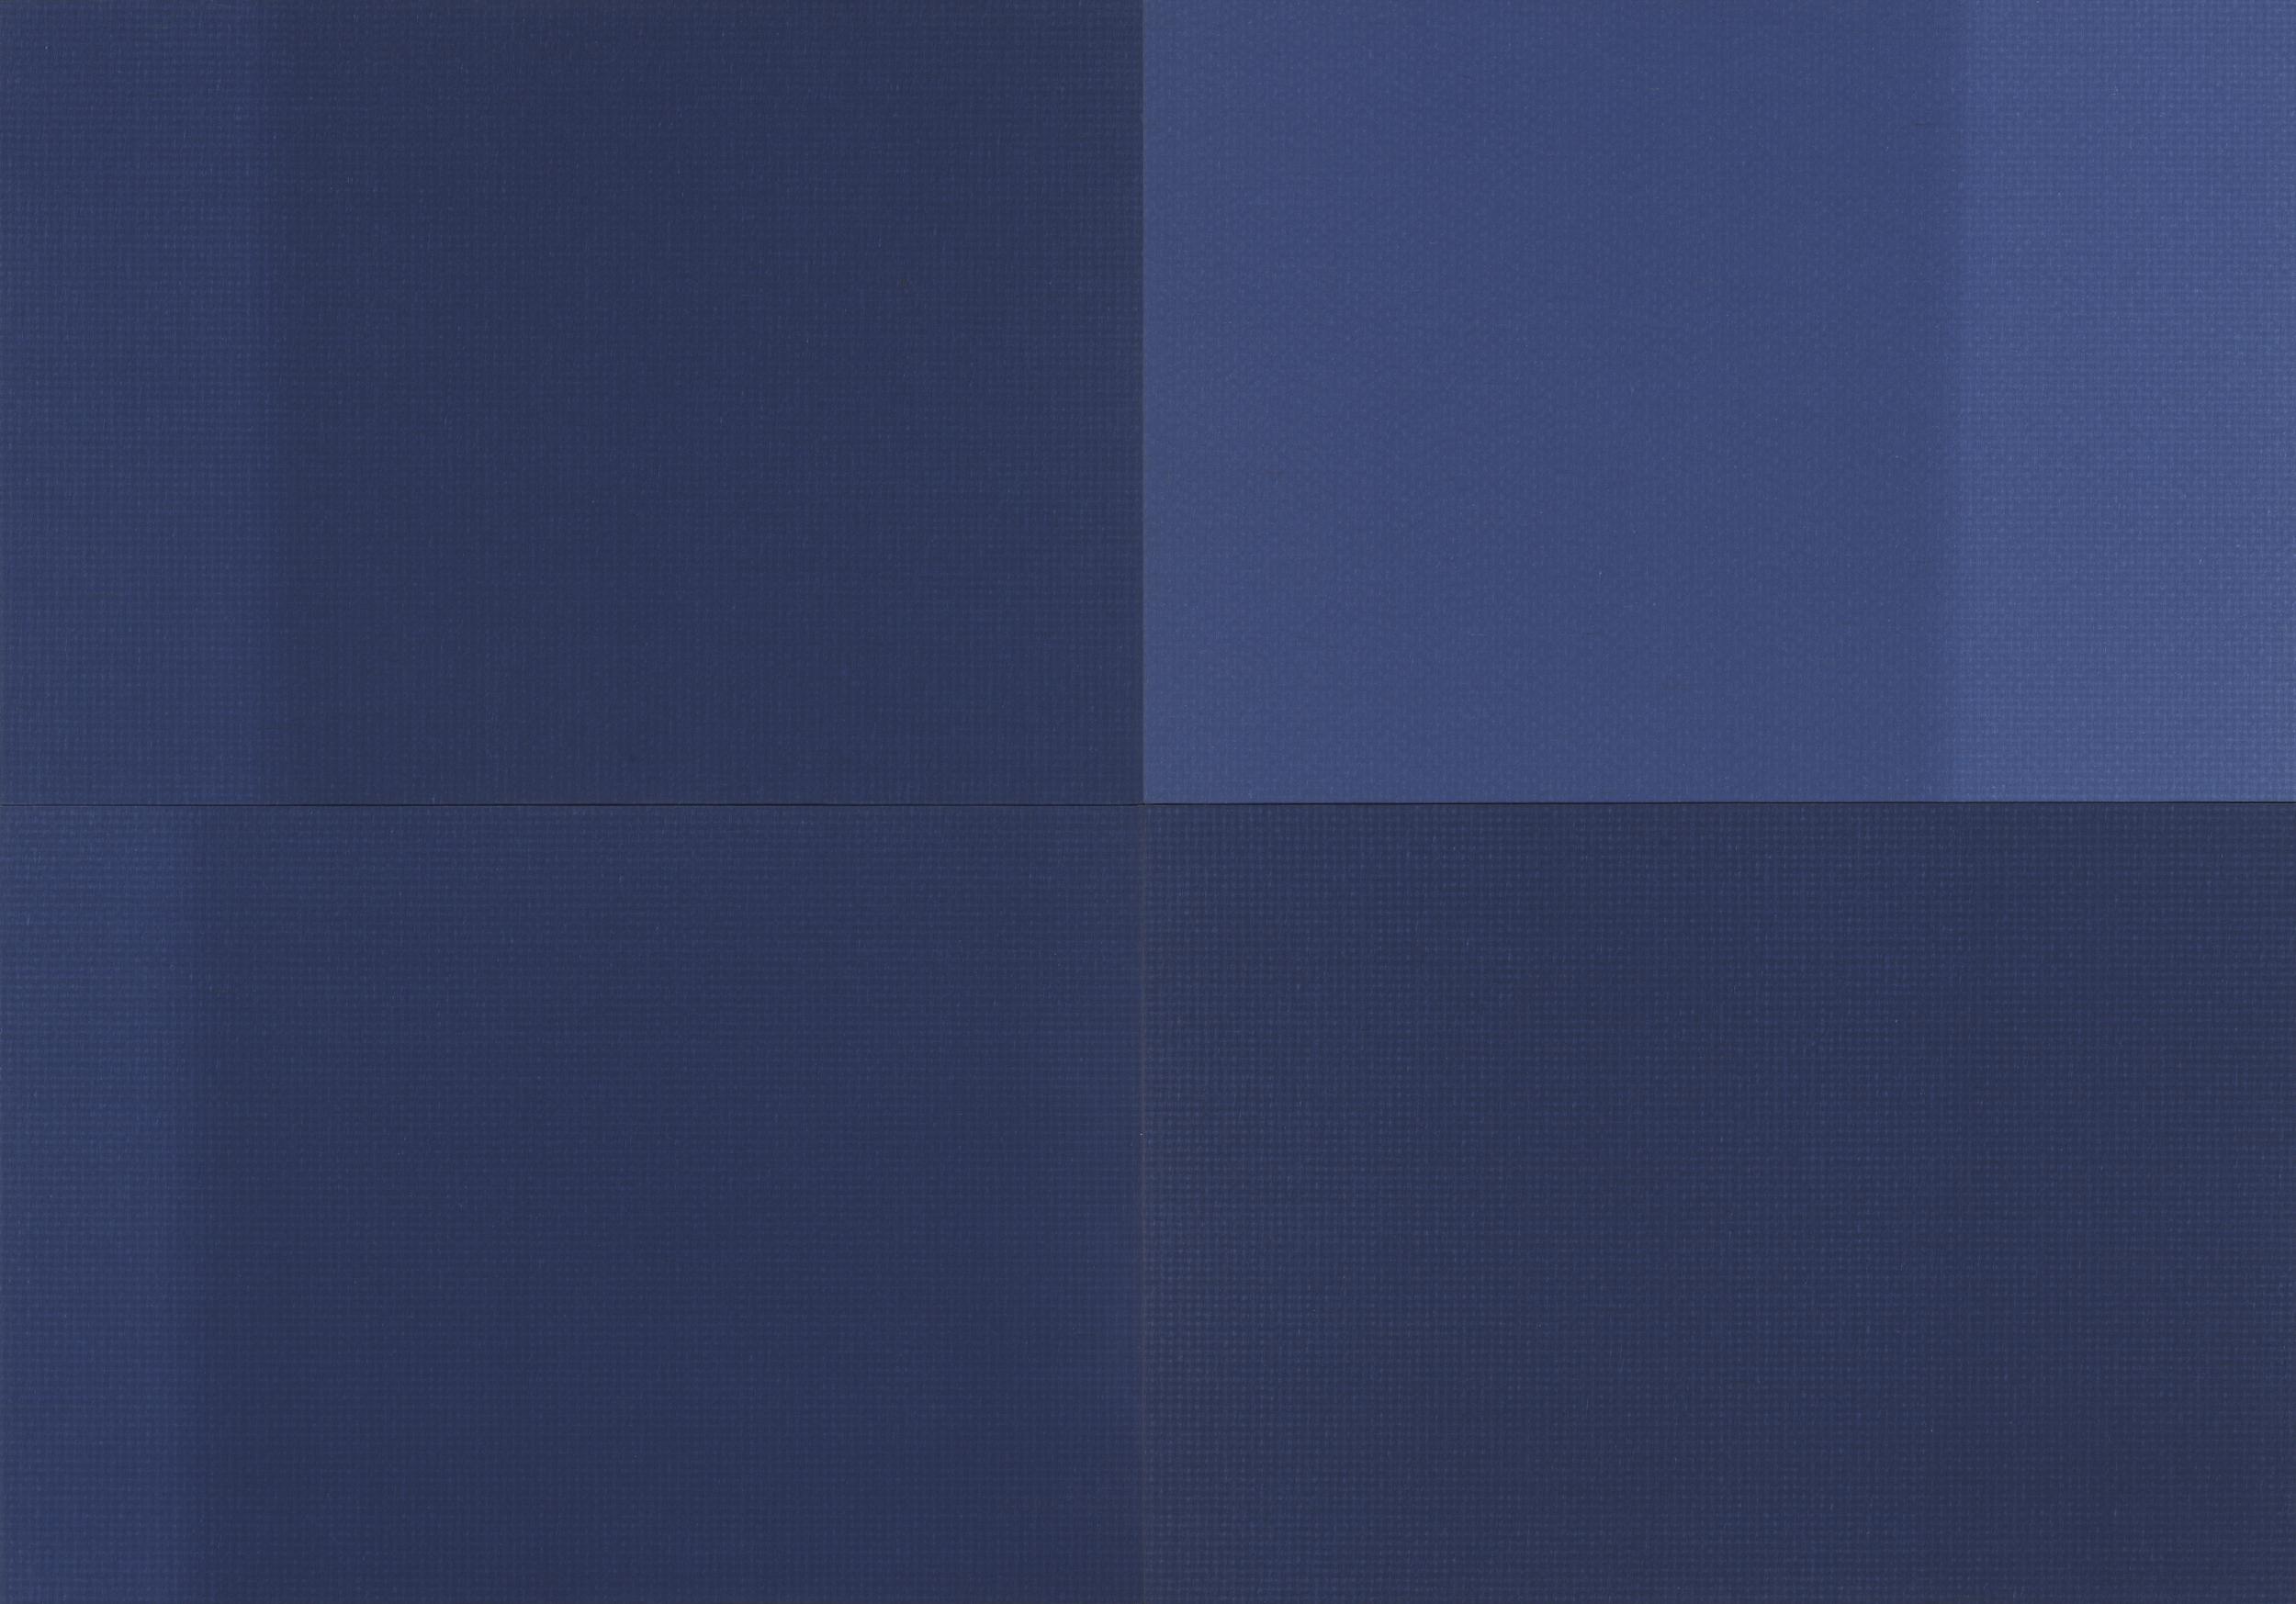 Rolando Tessadri, Tessere, 2017, 140x200 cm